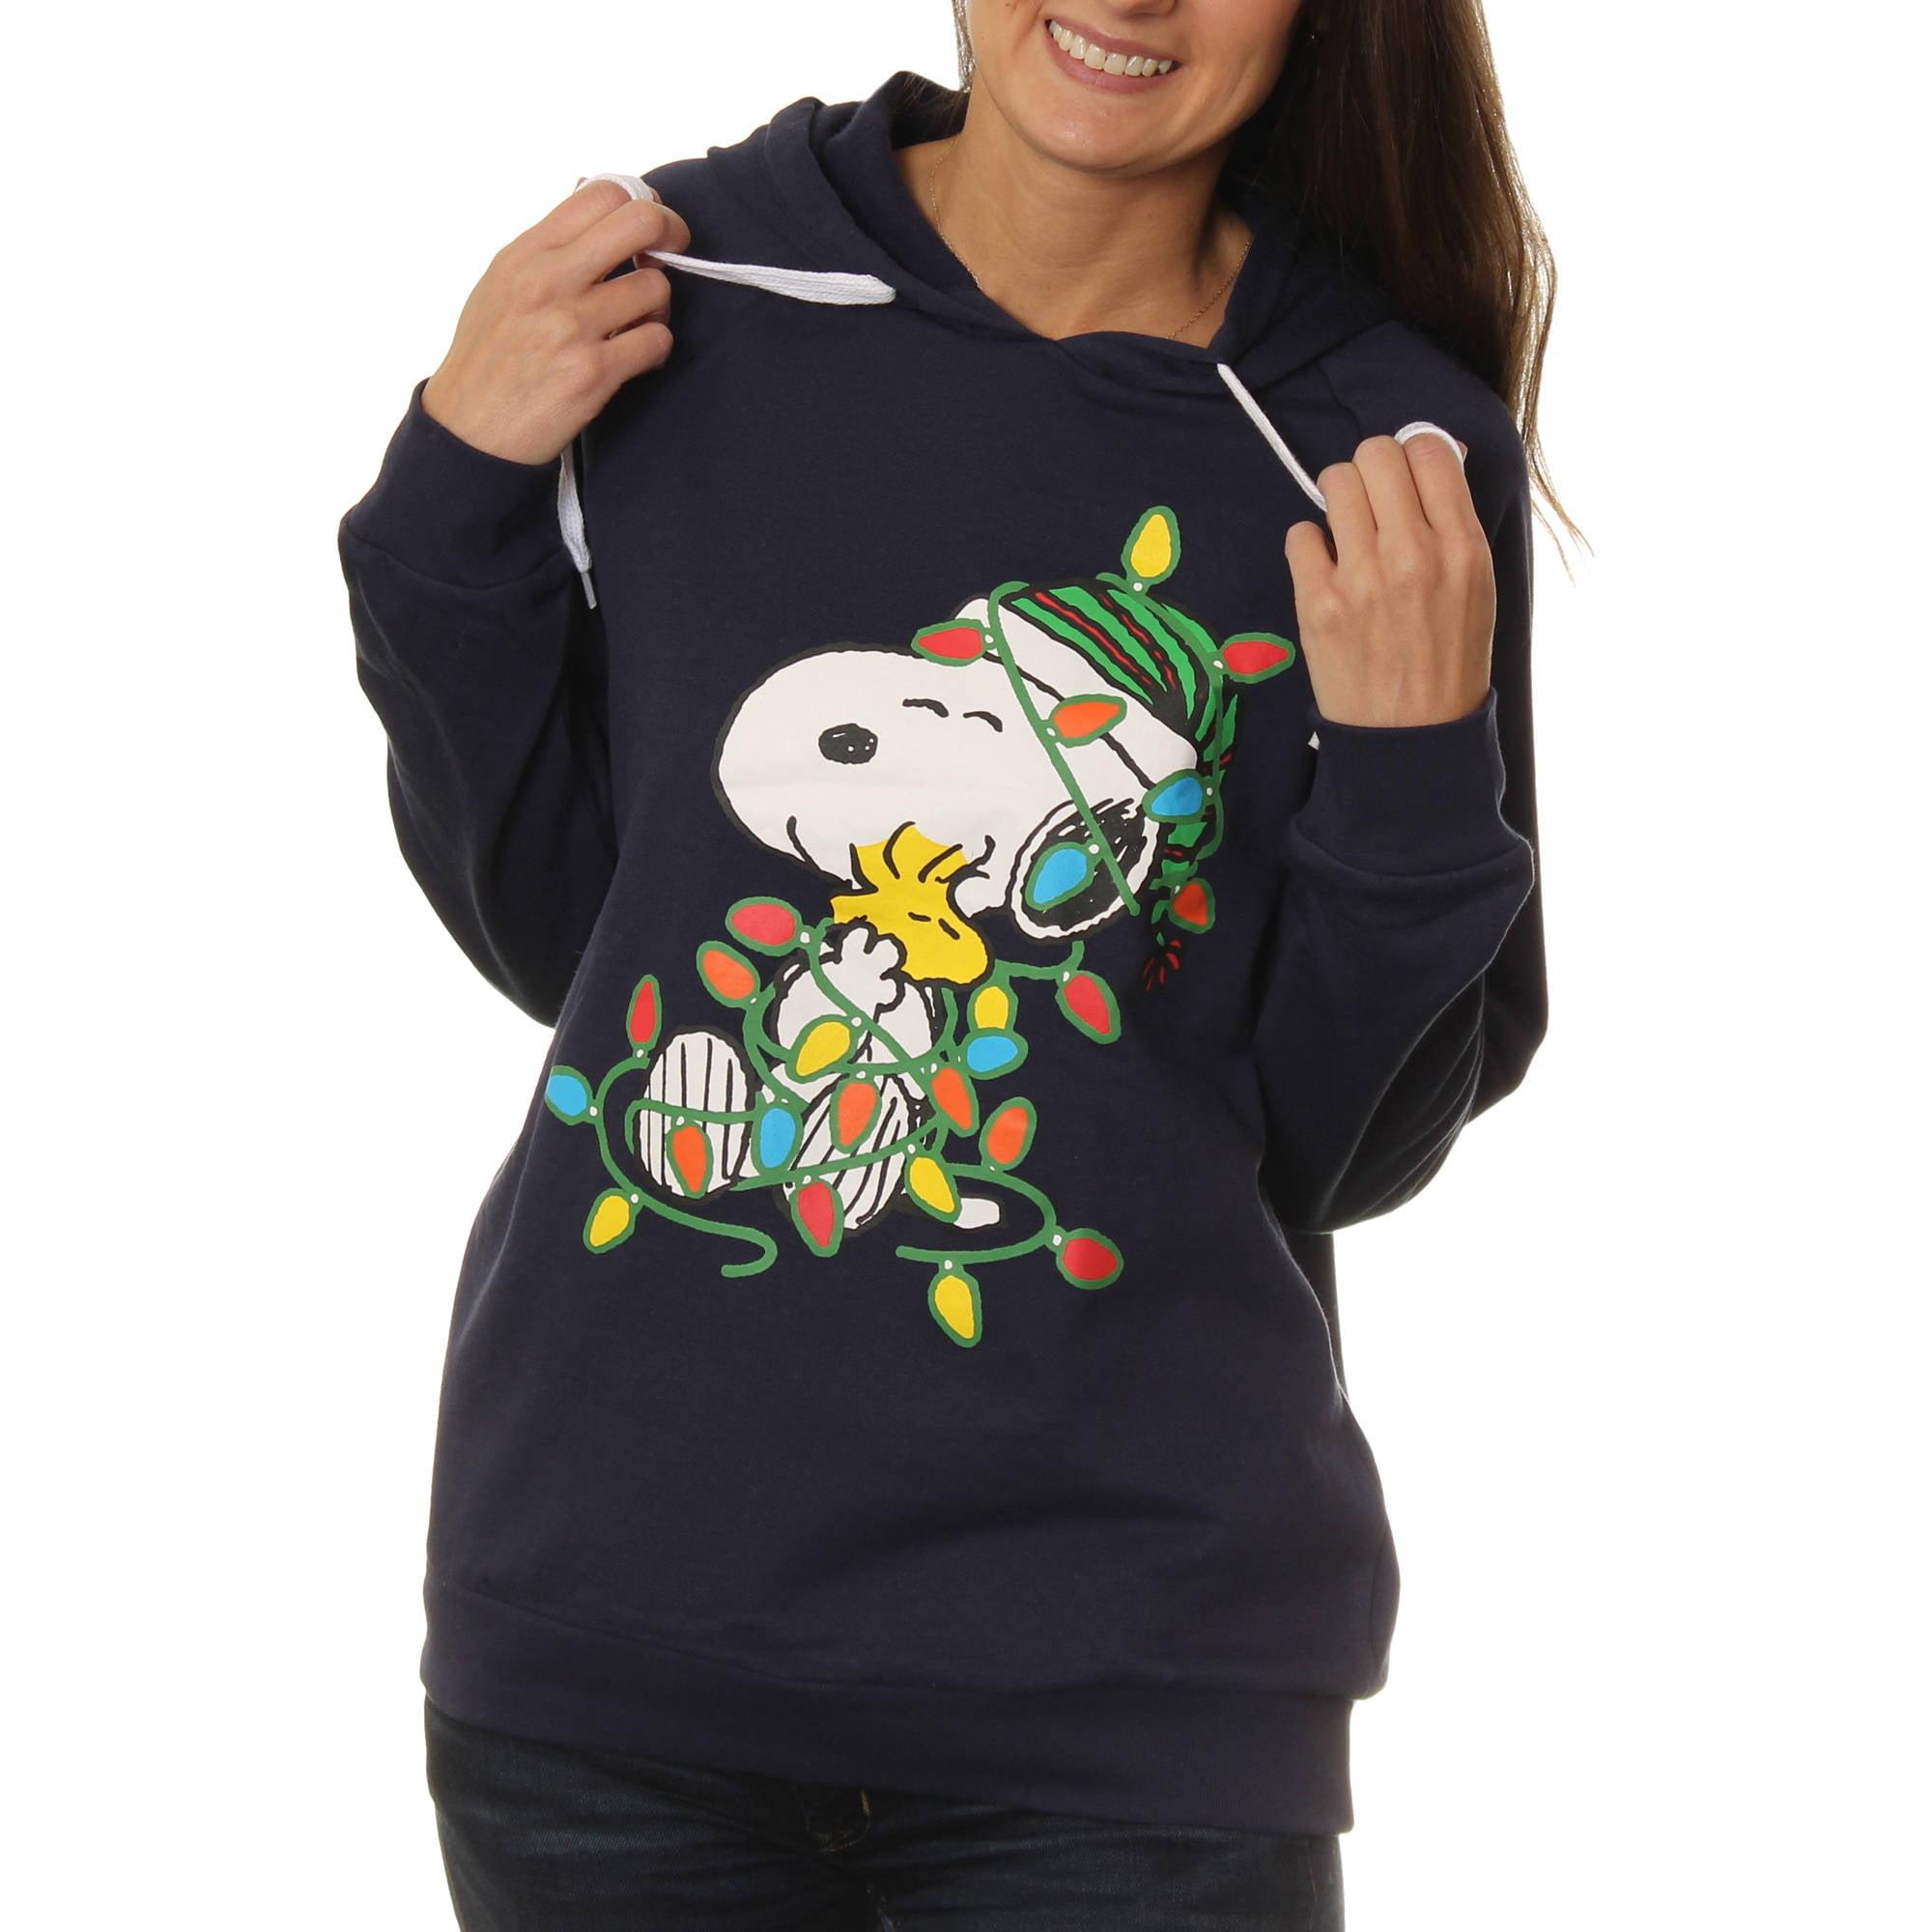 Peanuts Women's Snoopy and Woodstock Christmas Fleece Hoodie